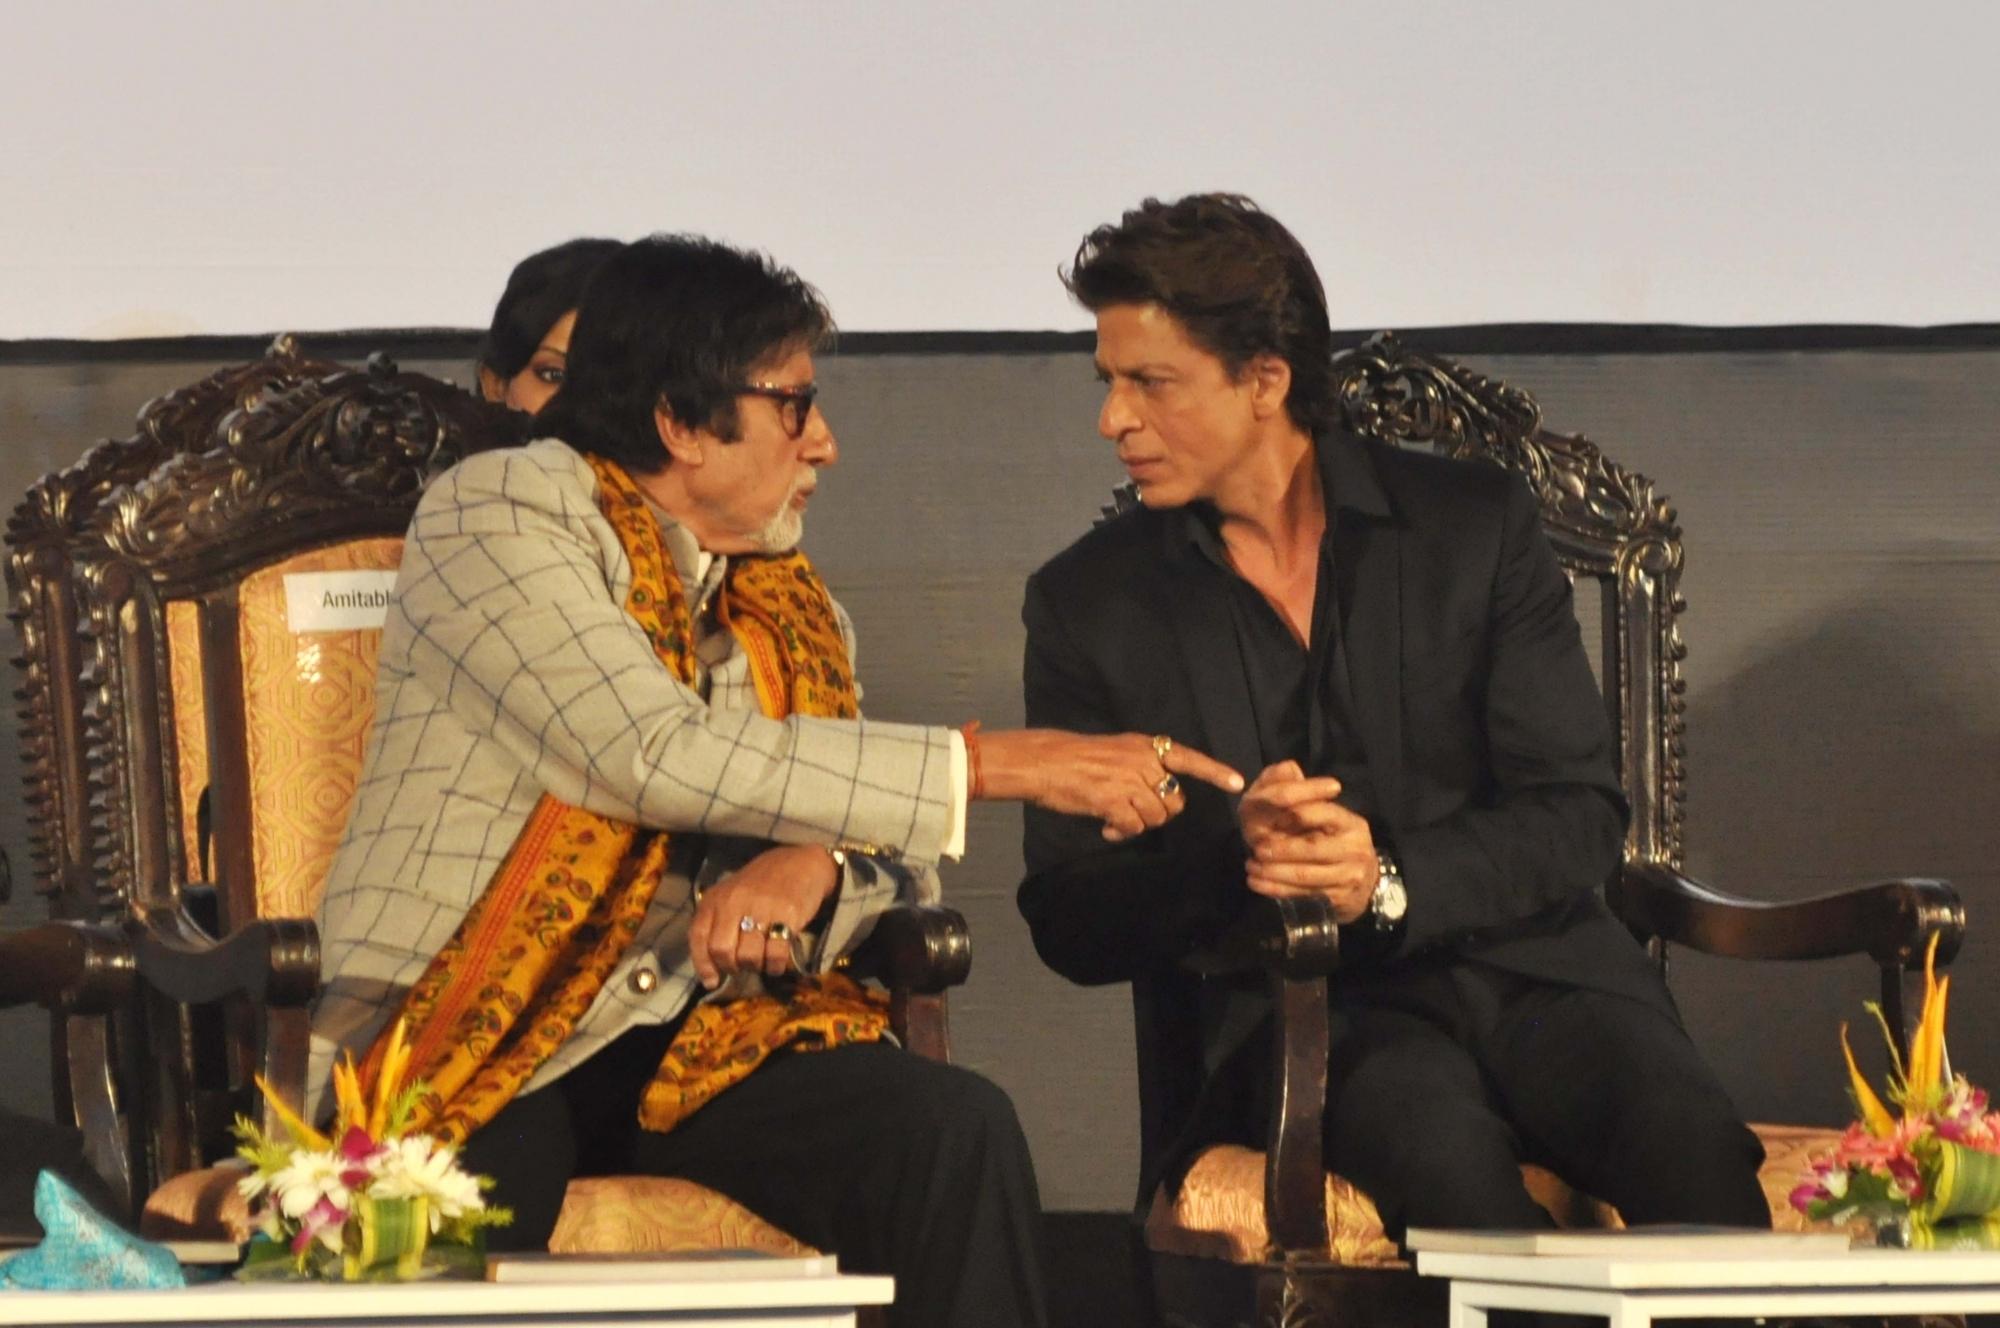 Shah Rukh Khan and Amitabh Bachchan To Inaugurate 25th Kolkata International Film Festival on November 8